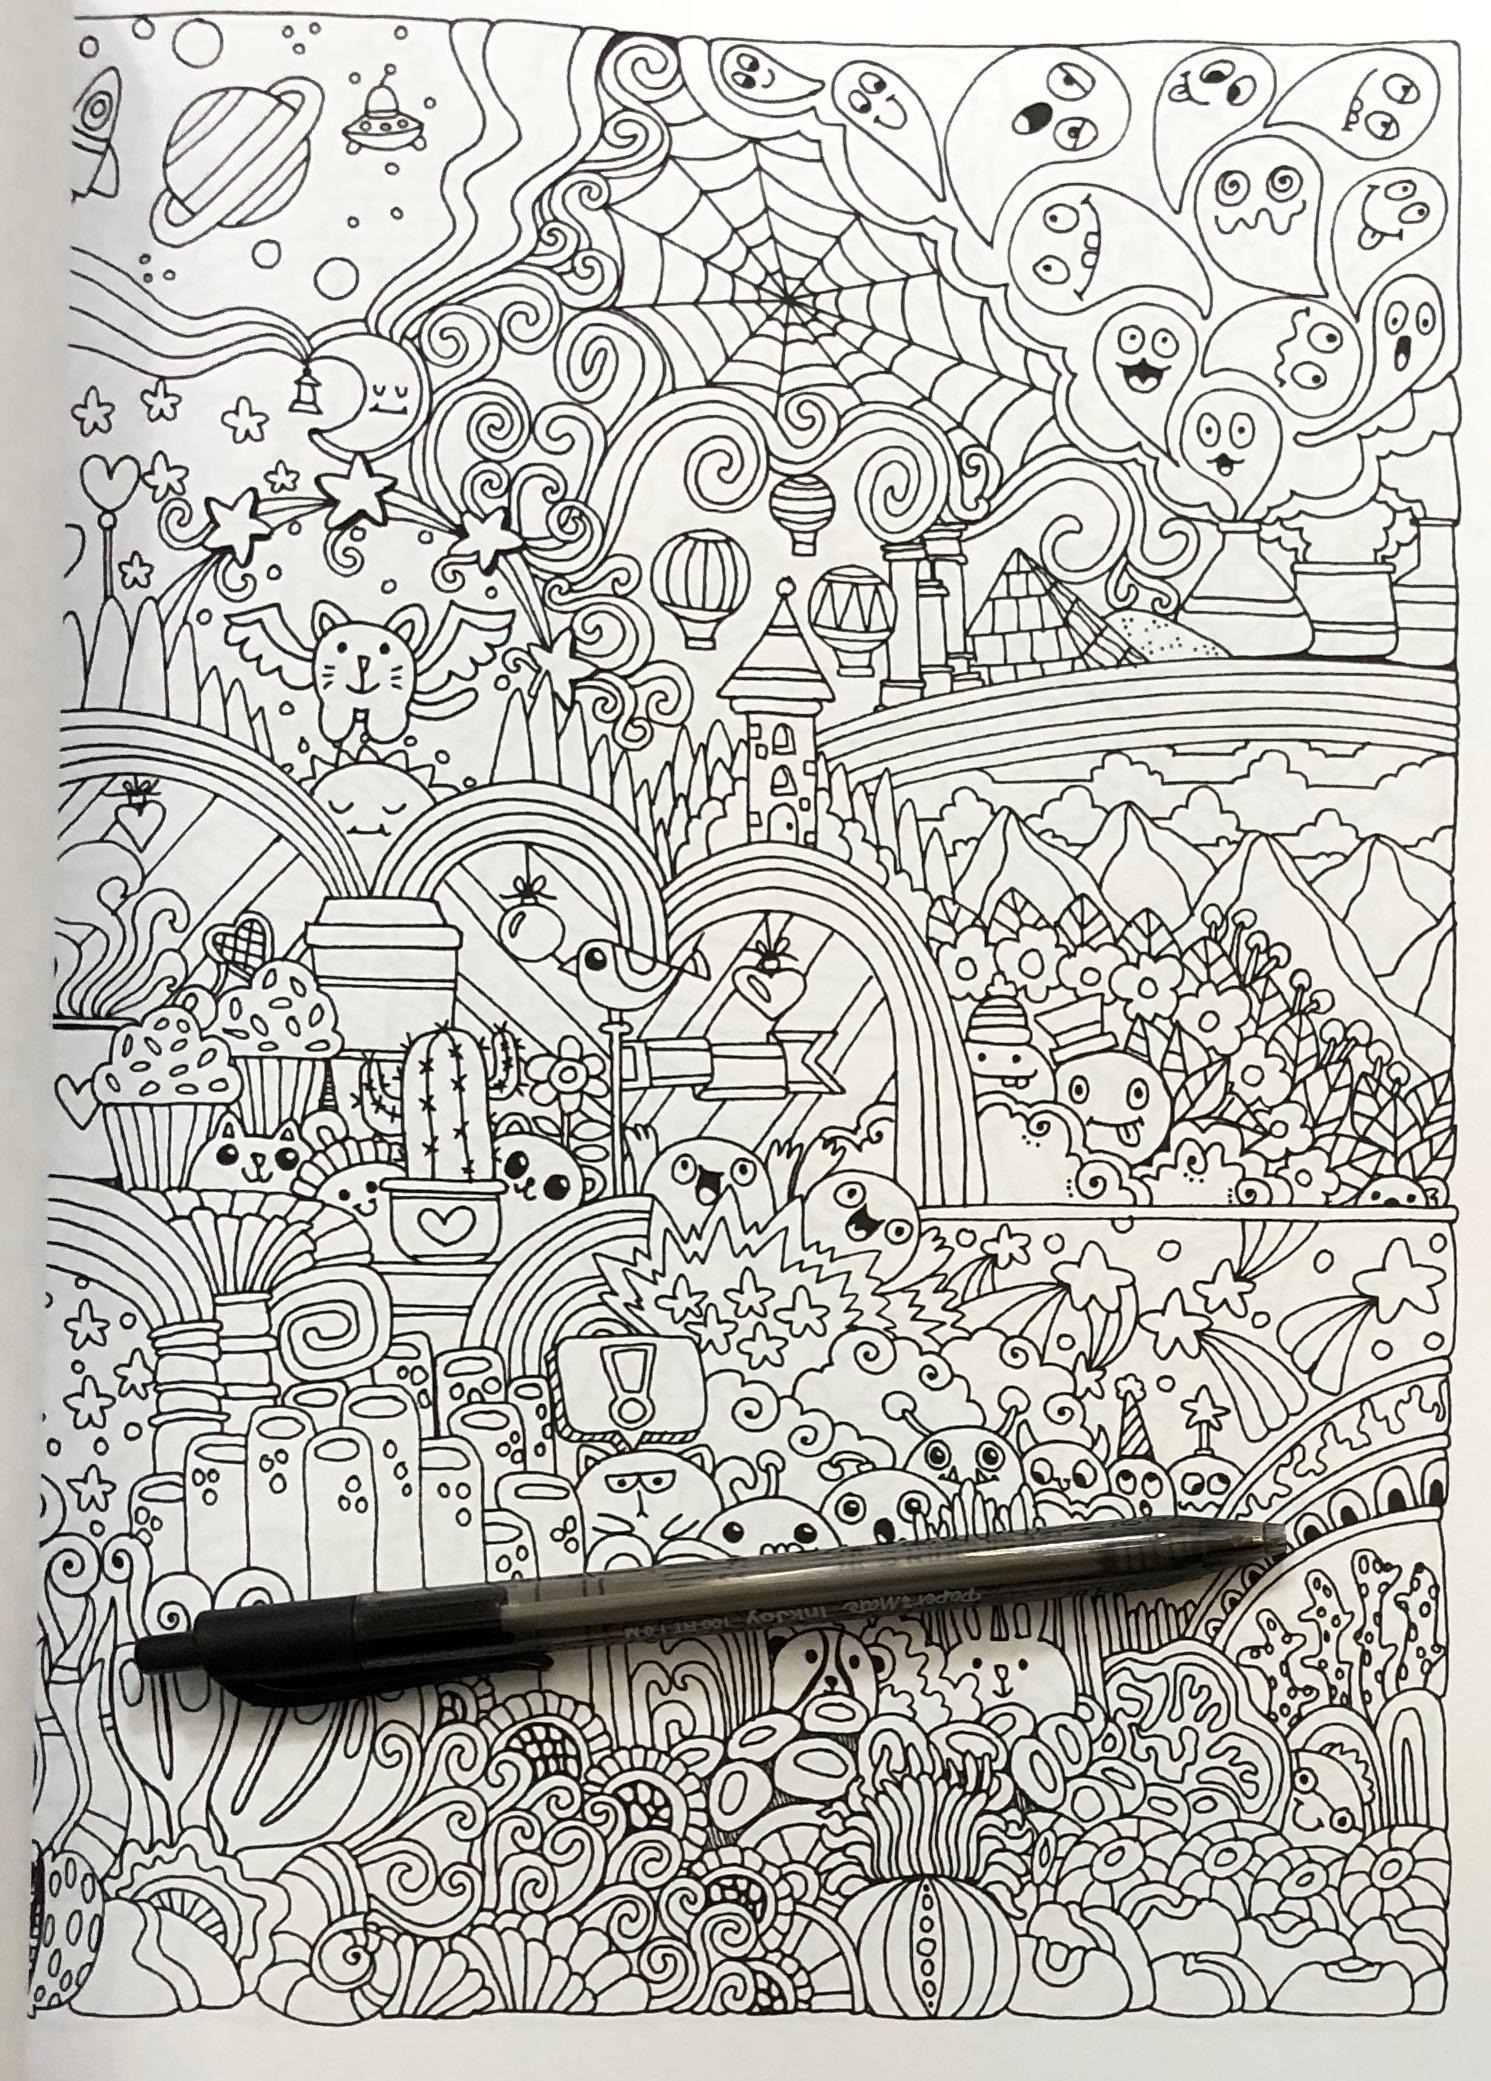 Bildergebnis für Angela porter coloring pages   Coloring pages ...   2081x1491